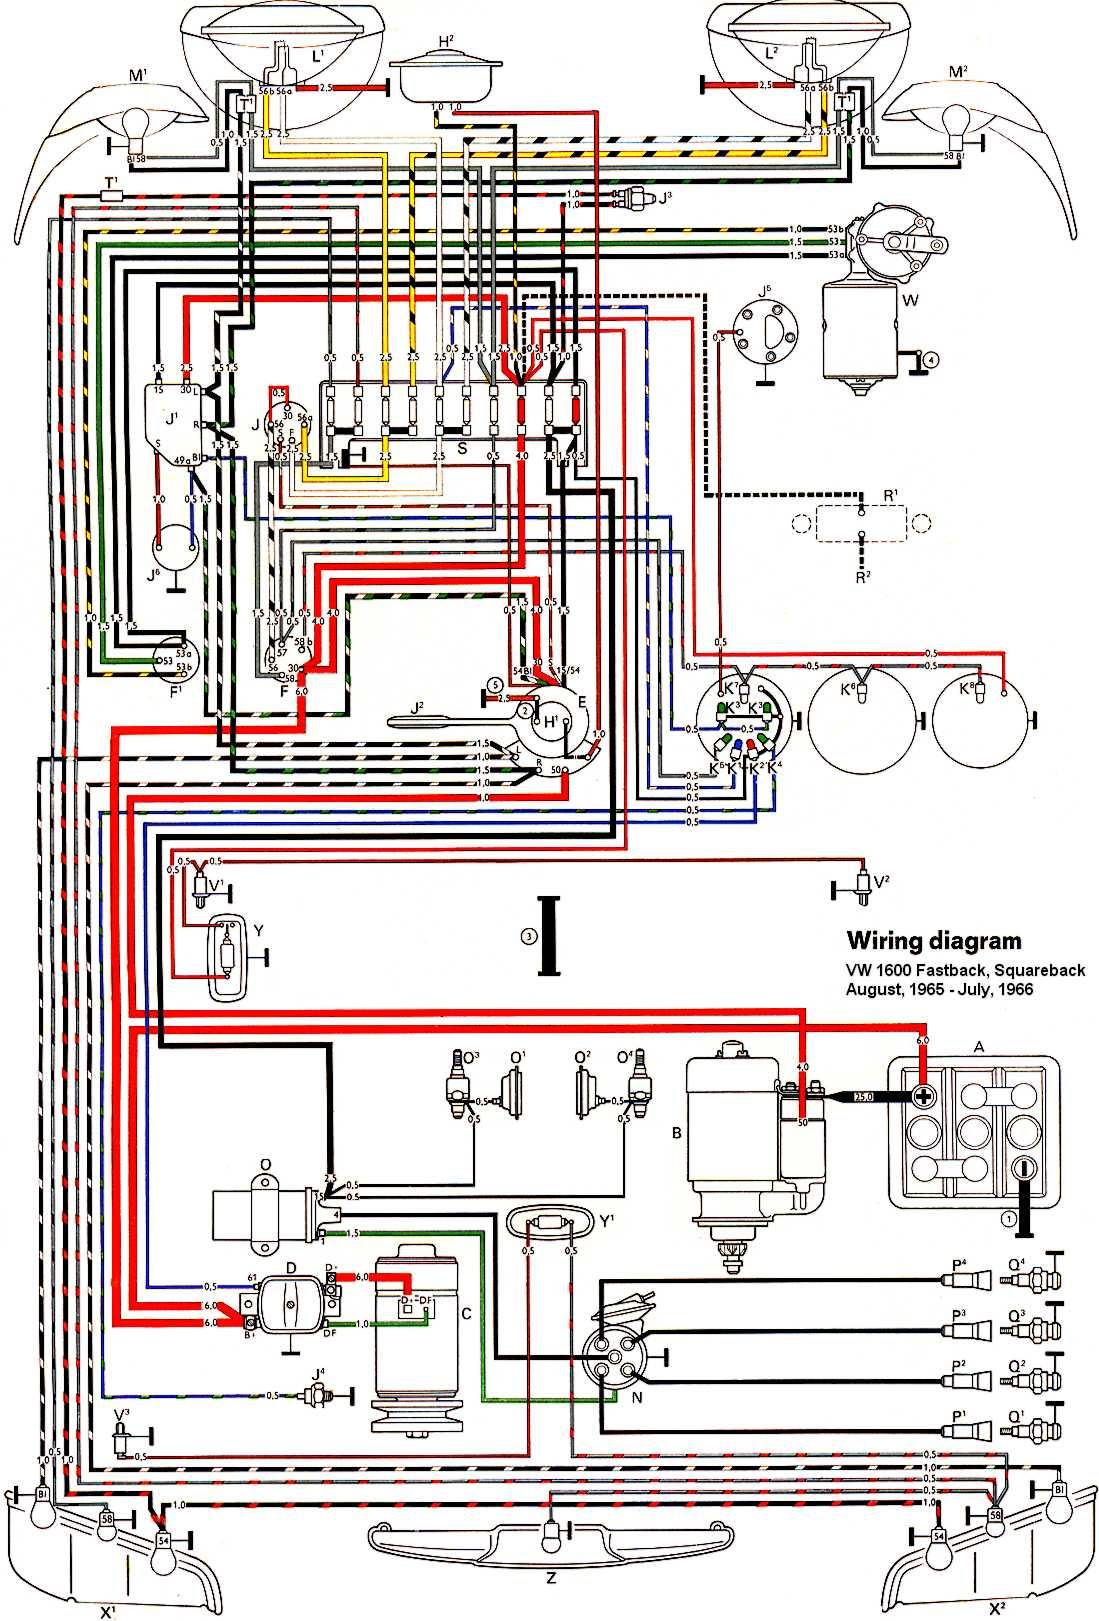 1969 Vw Bug Coil Wiring Diagram 98 Range Rover Eas Wiring Diagram Hinoengine Yenpancane Jeanjaures37 Fr